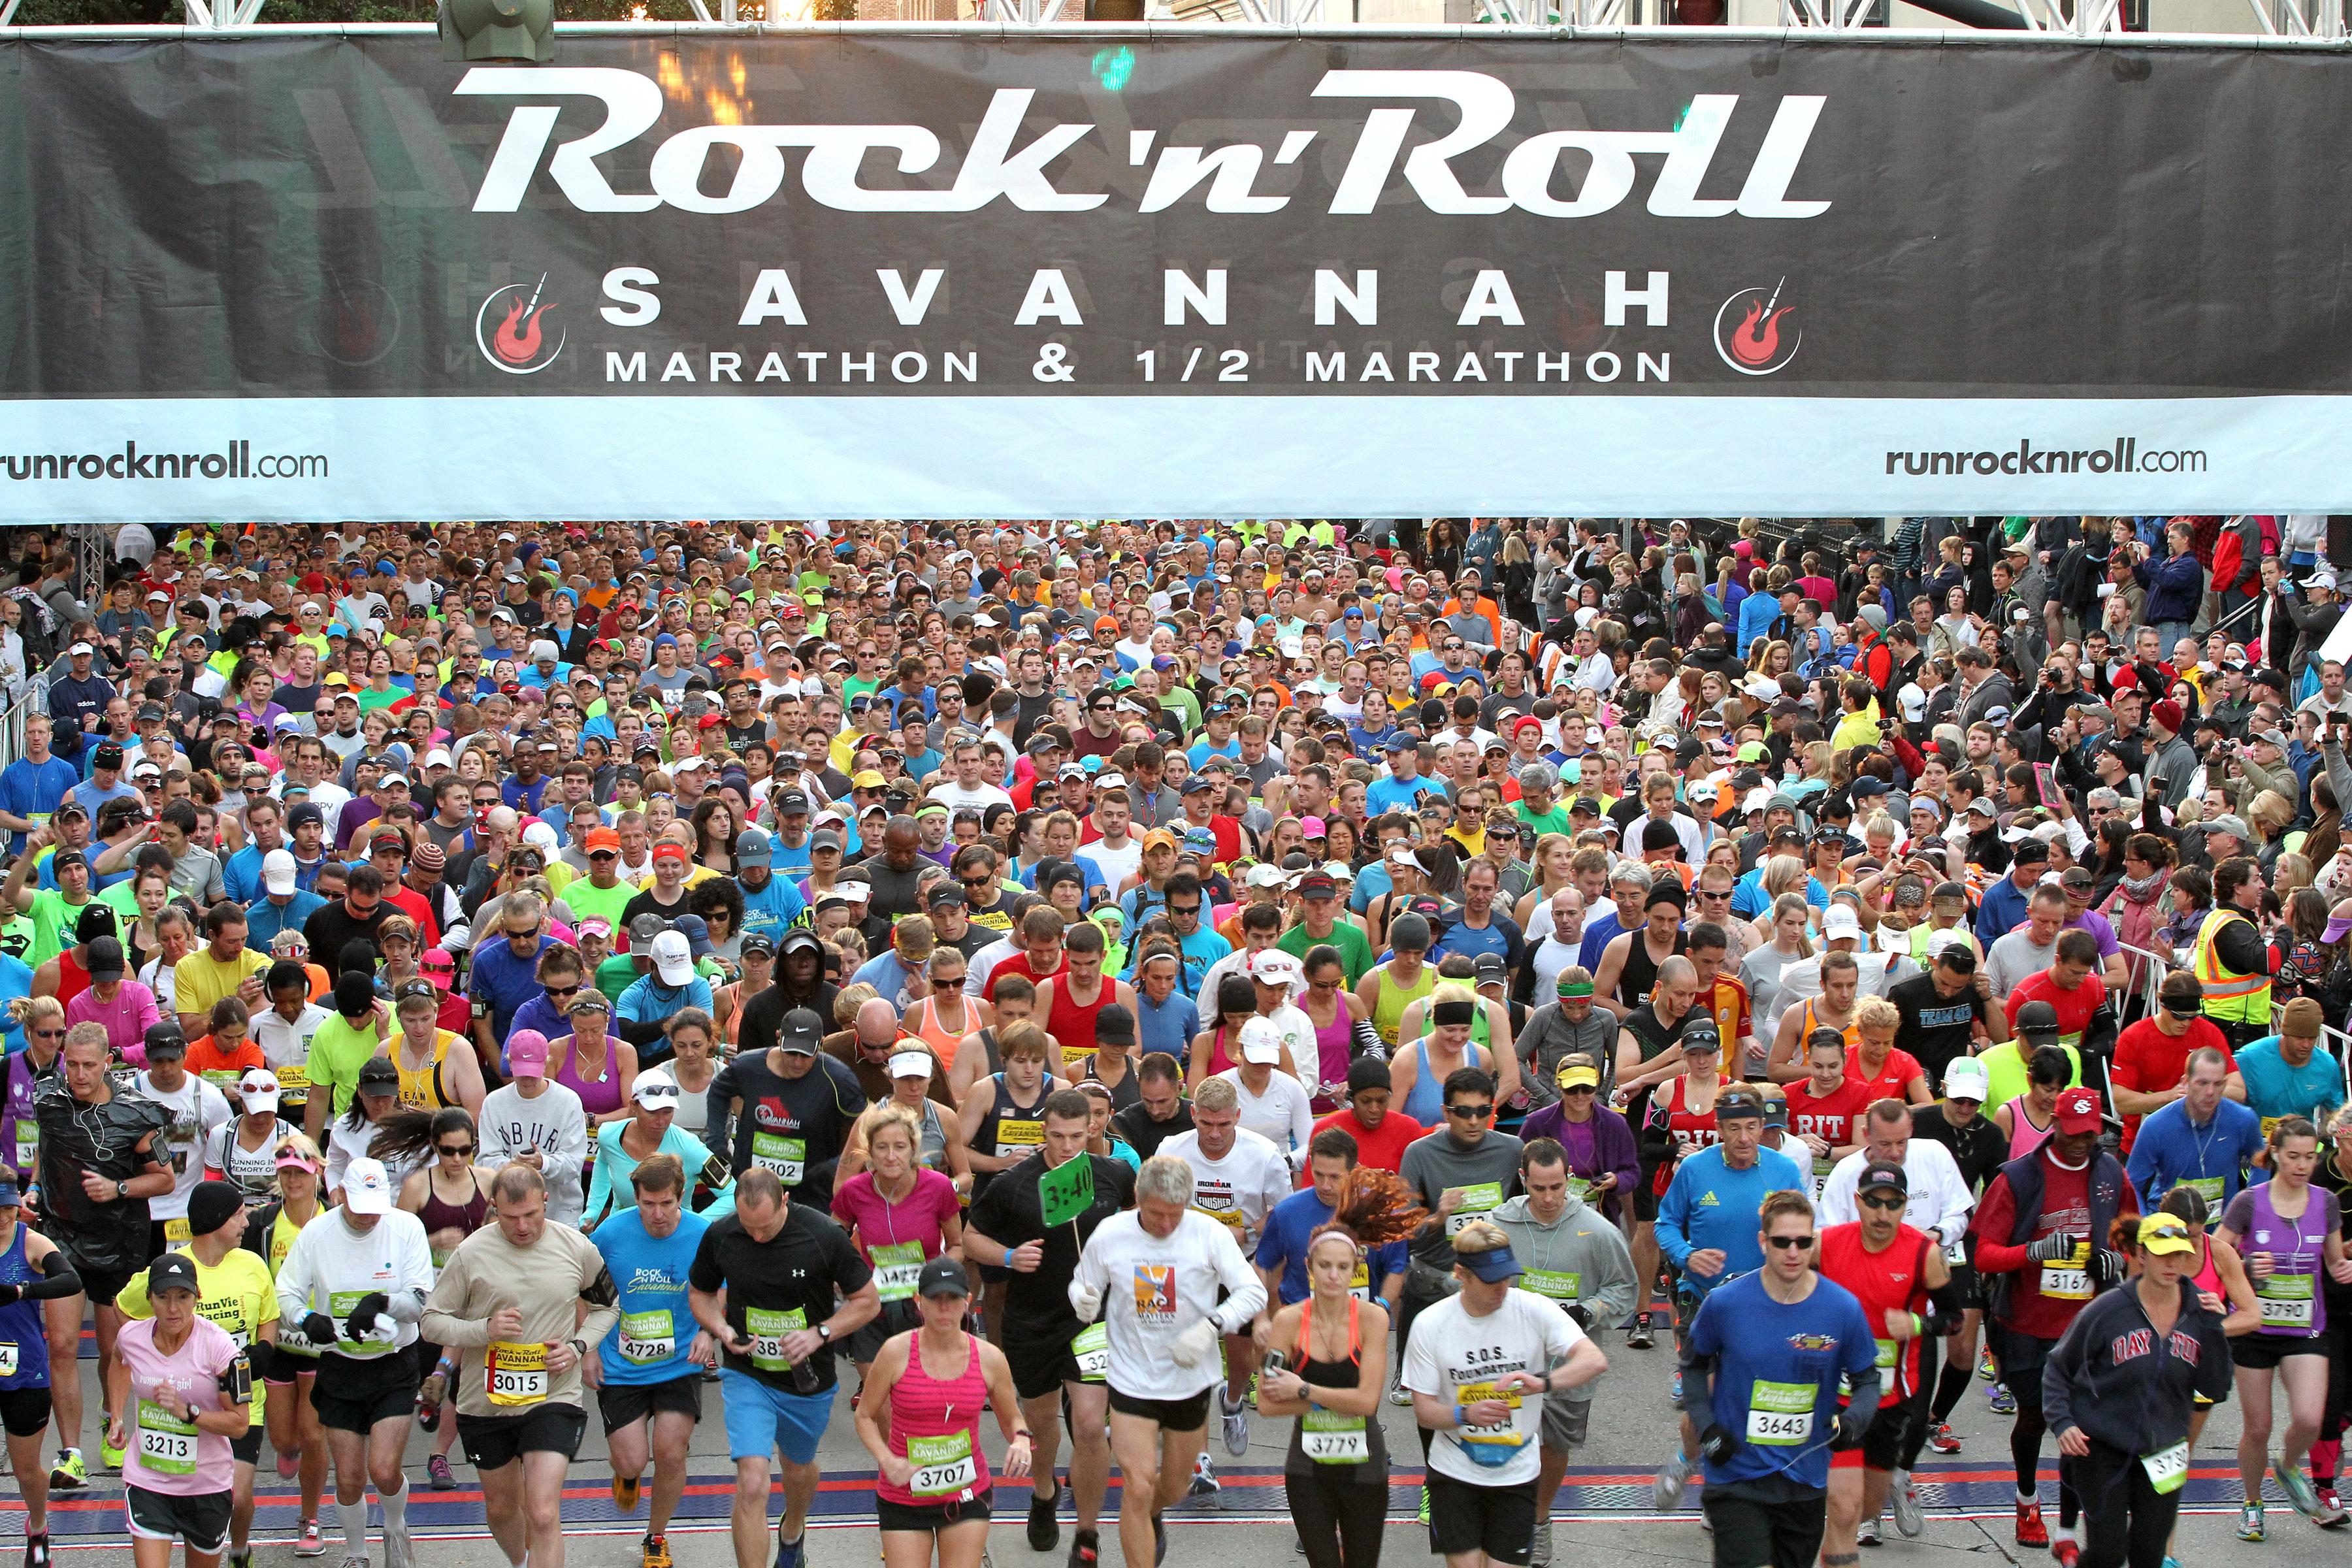 2013 Savannah Rock n Roll Marathon